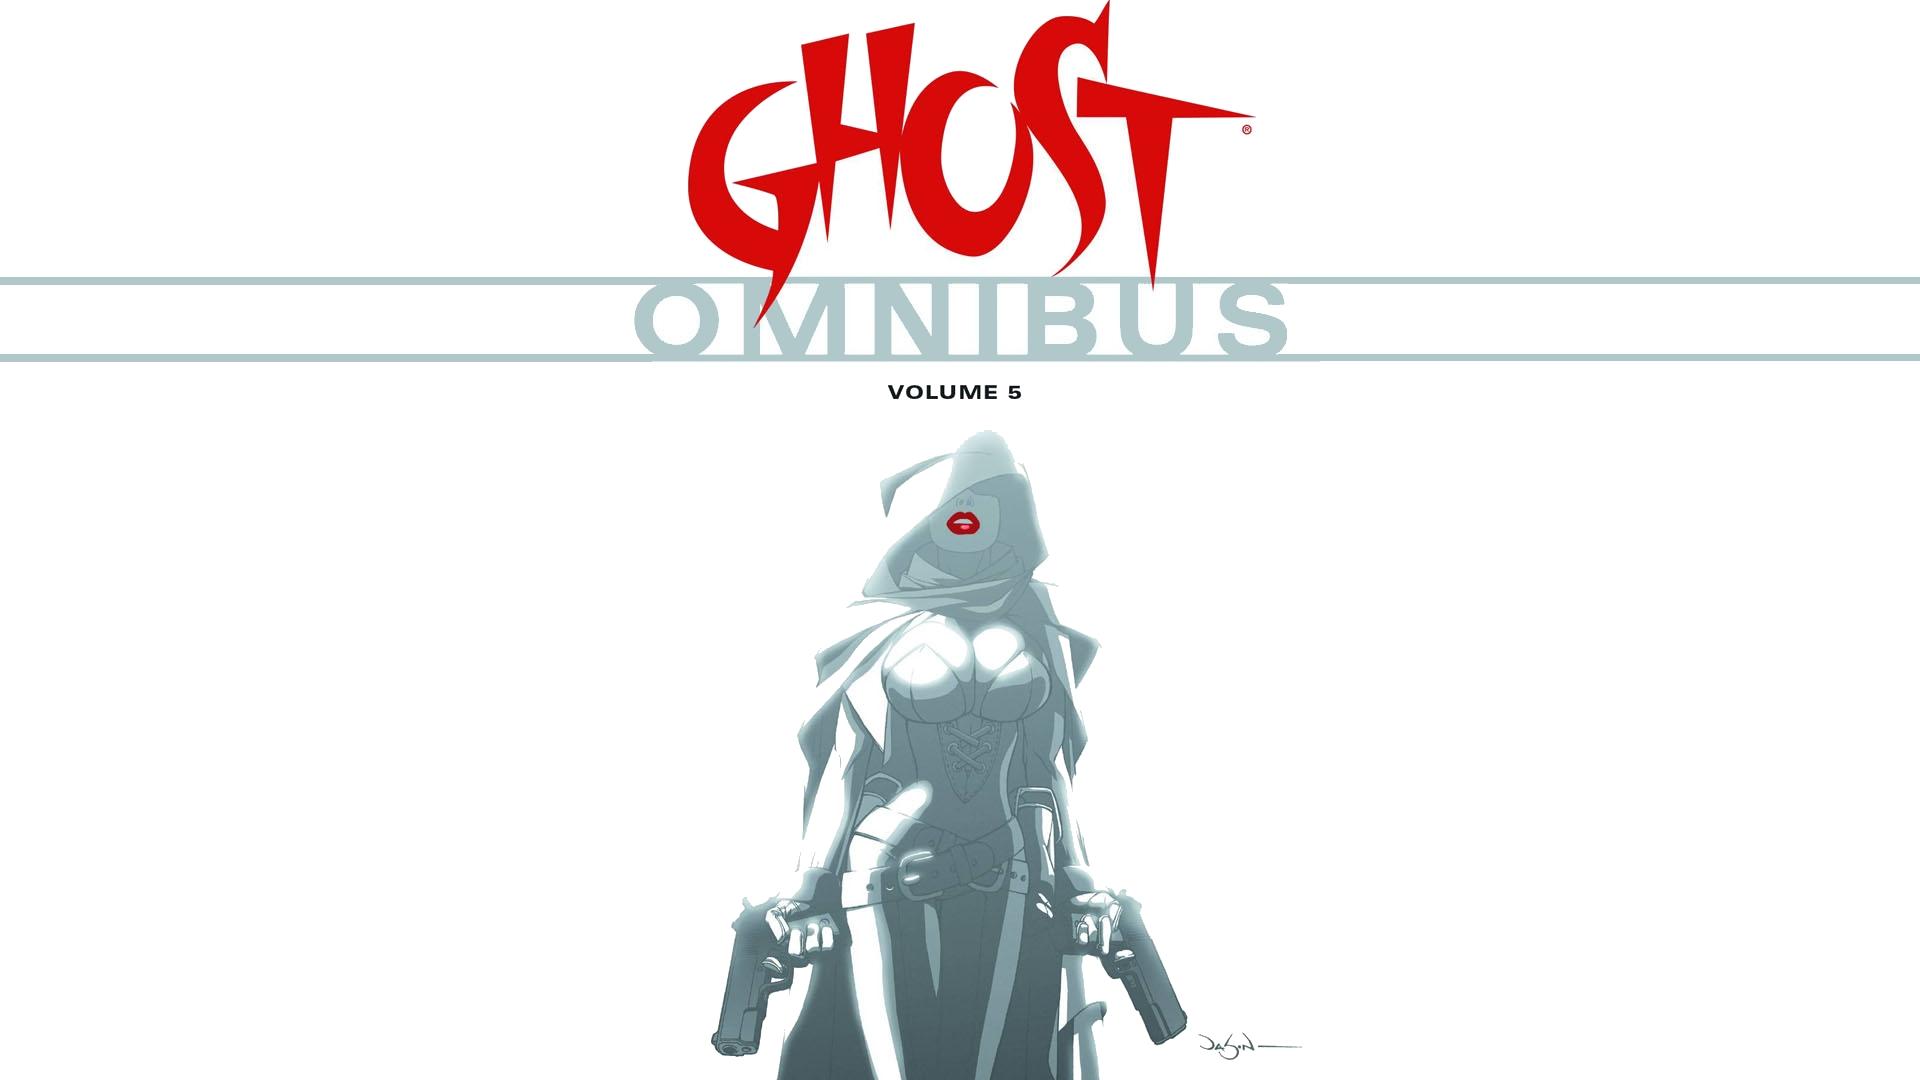 Ghost Dark Horse Comics 1920x1080